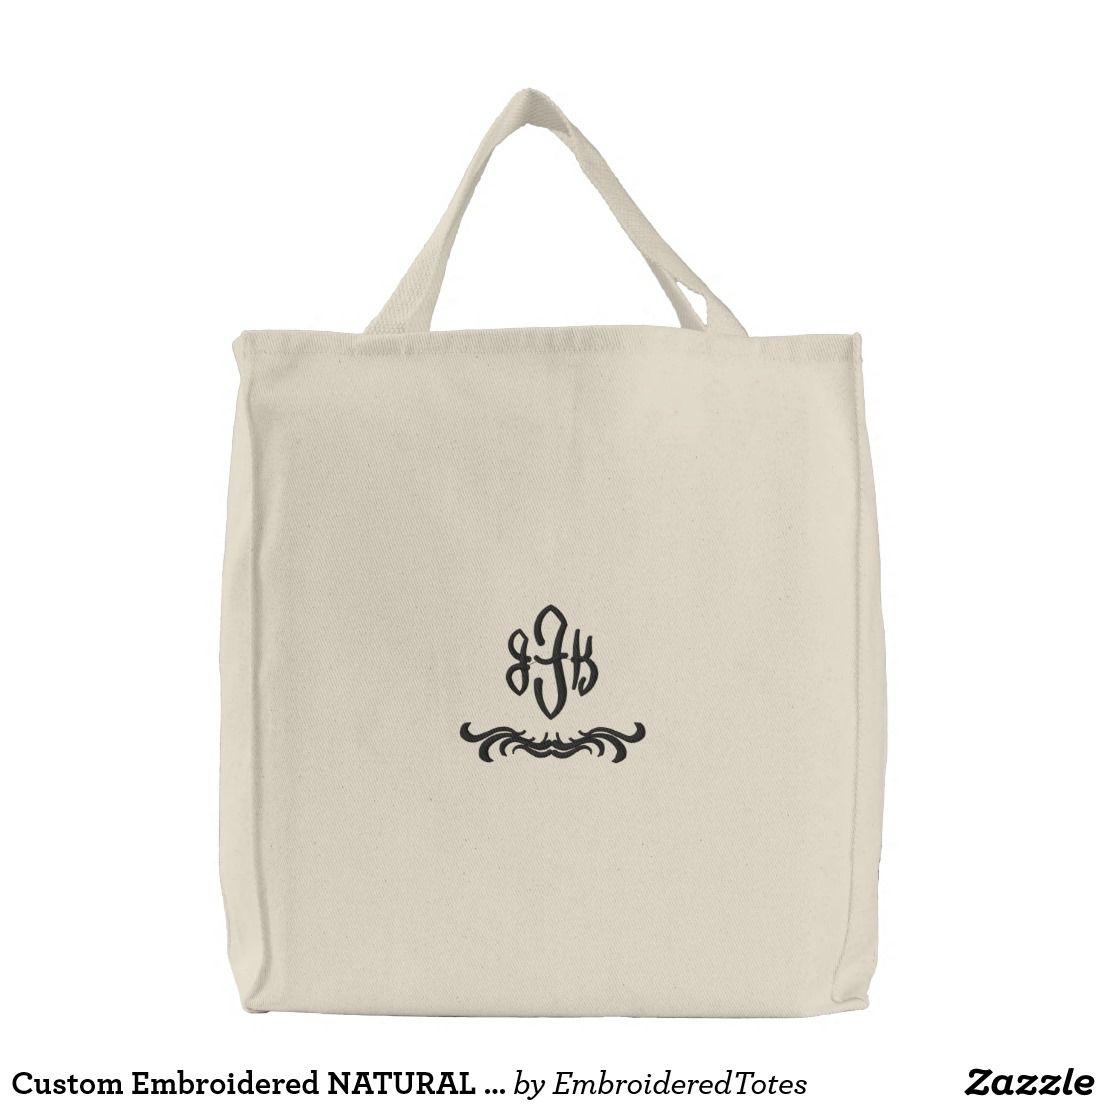 Download Custom Embroidered Natural Totes Monogram 14 Embroidered Tote Bag Embroidered Tote Tote Bag Design